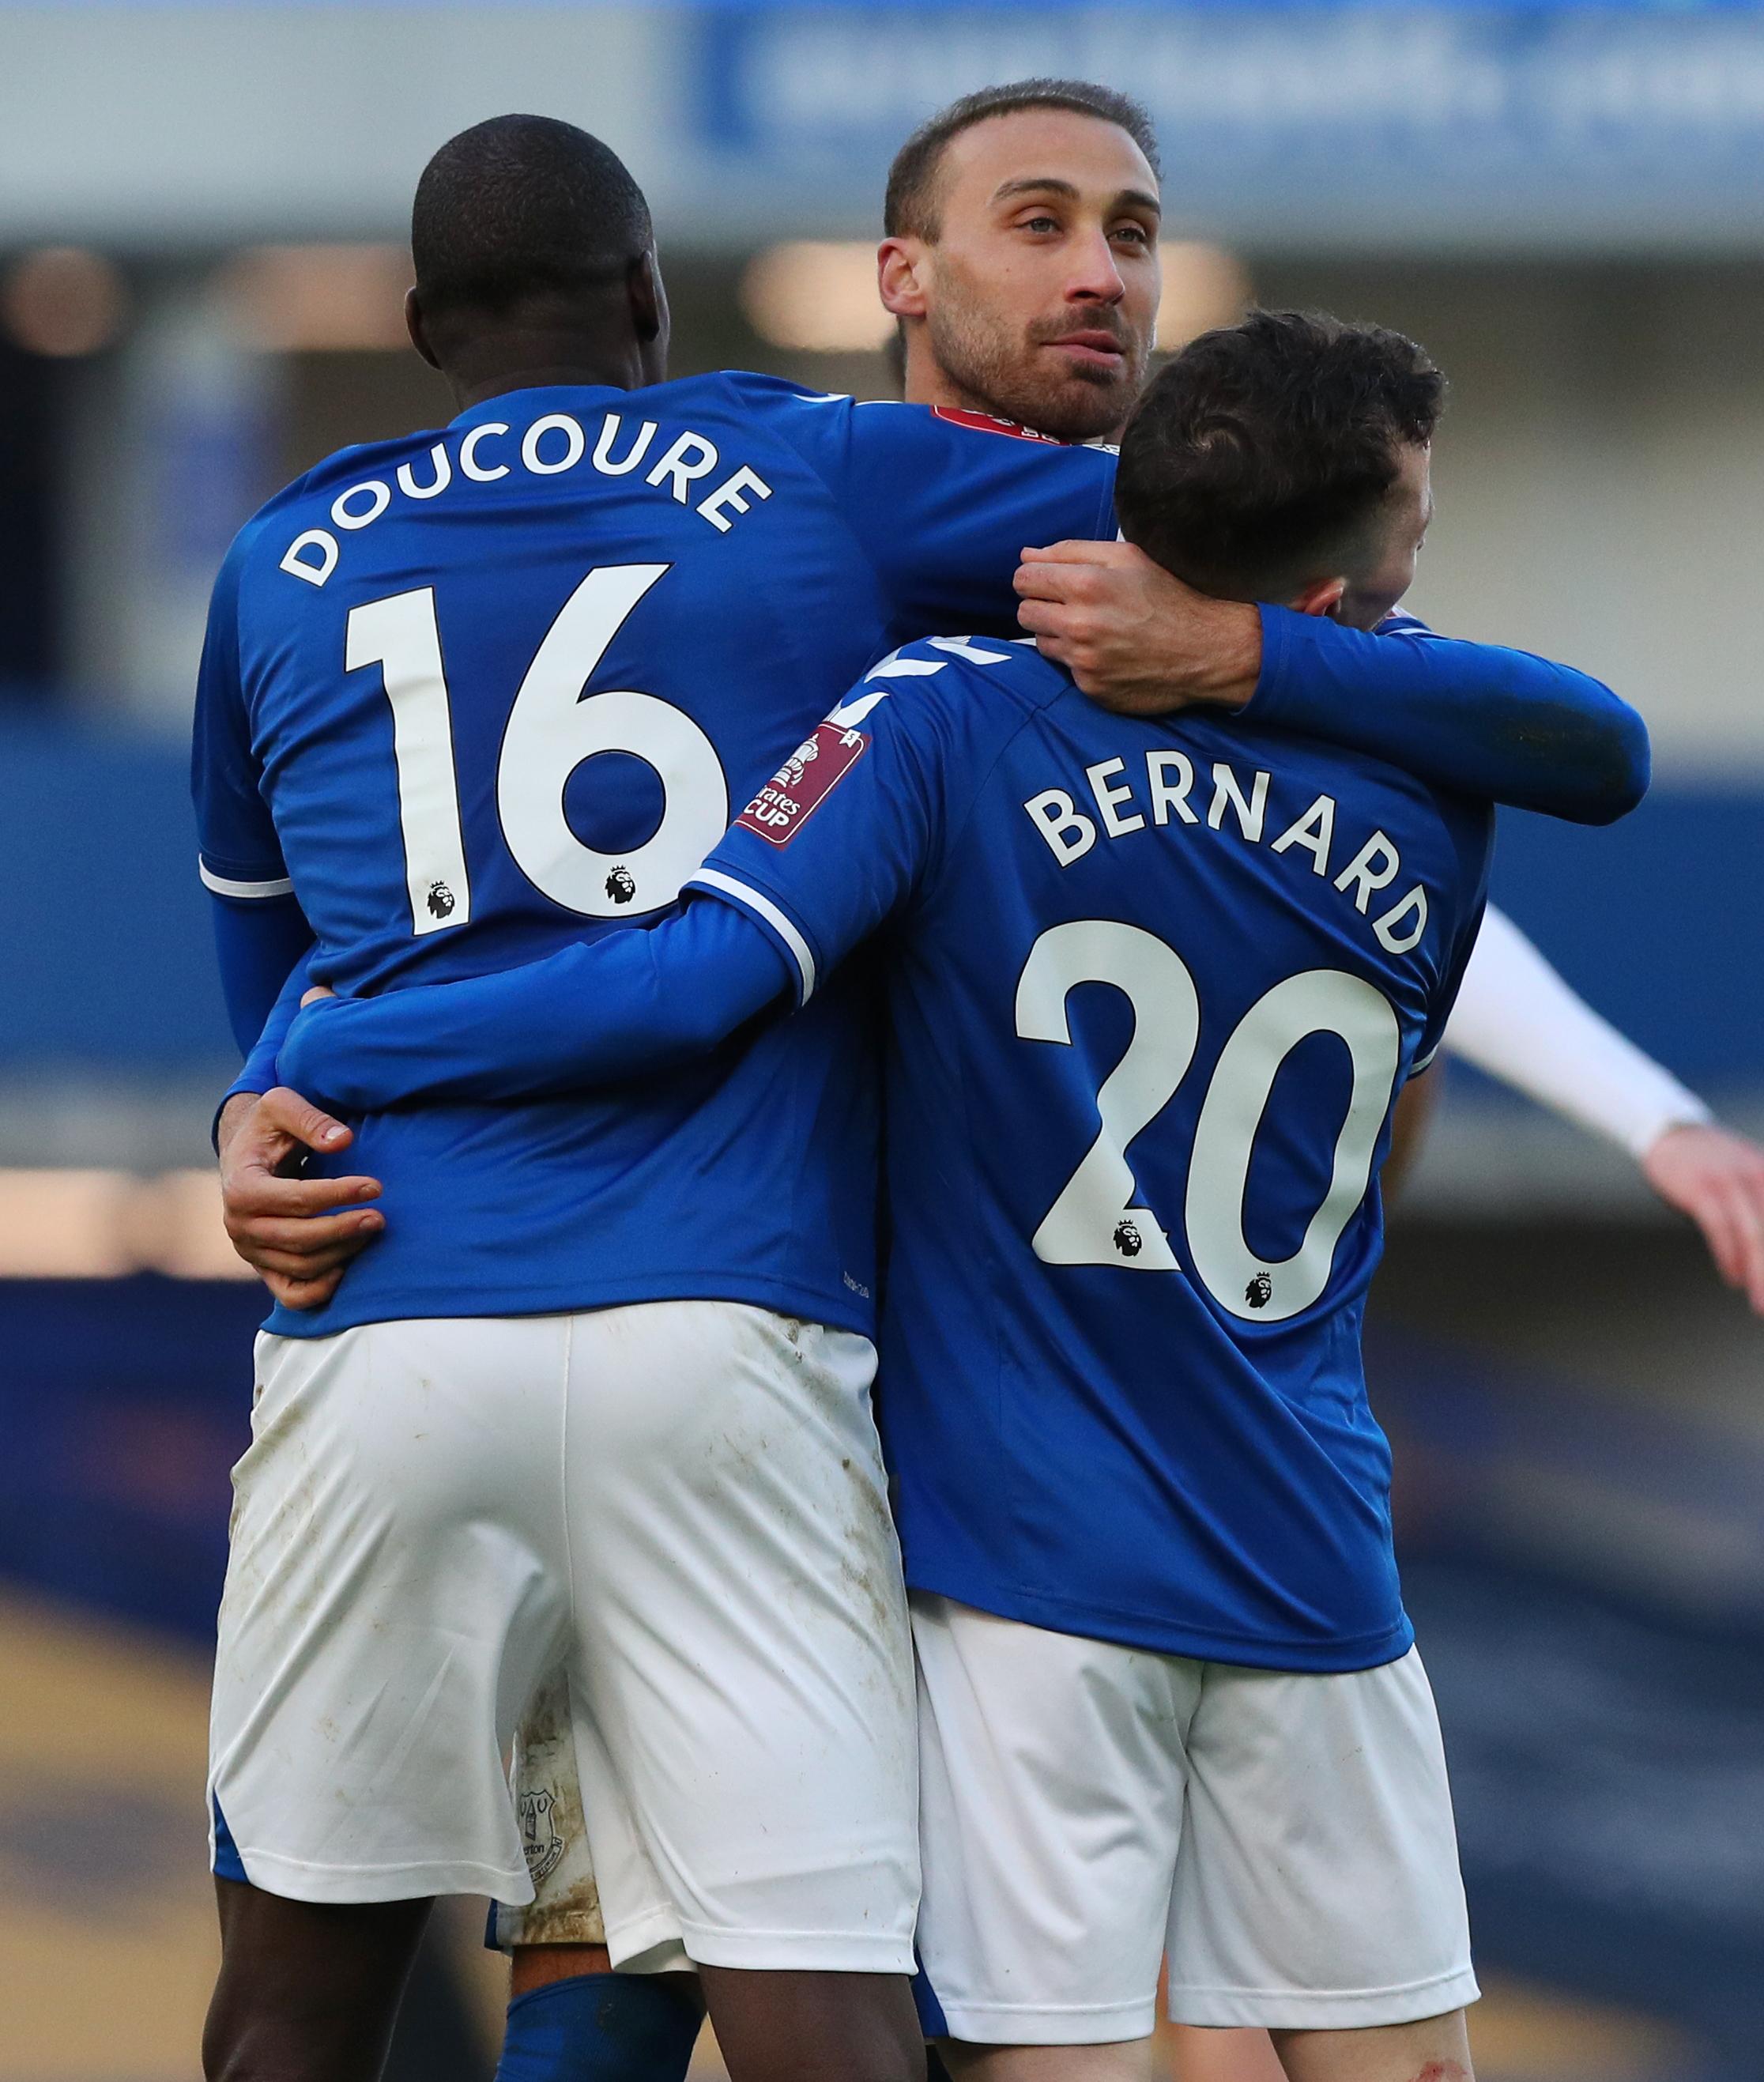 Everton v Rotherham United - Emirates FA Cup - Third Round - Goodison Park